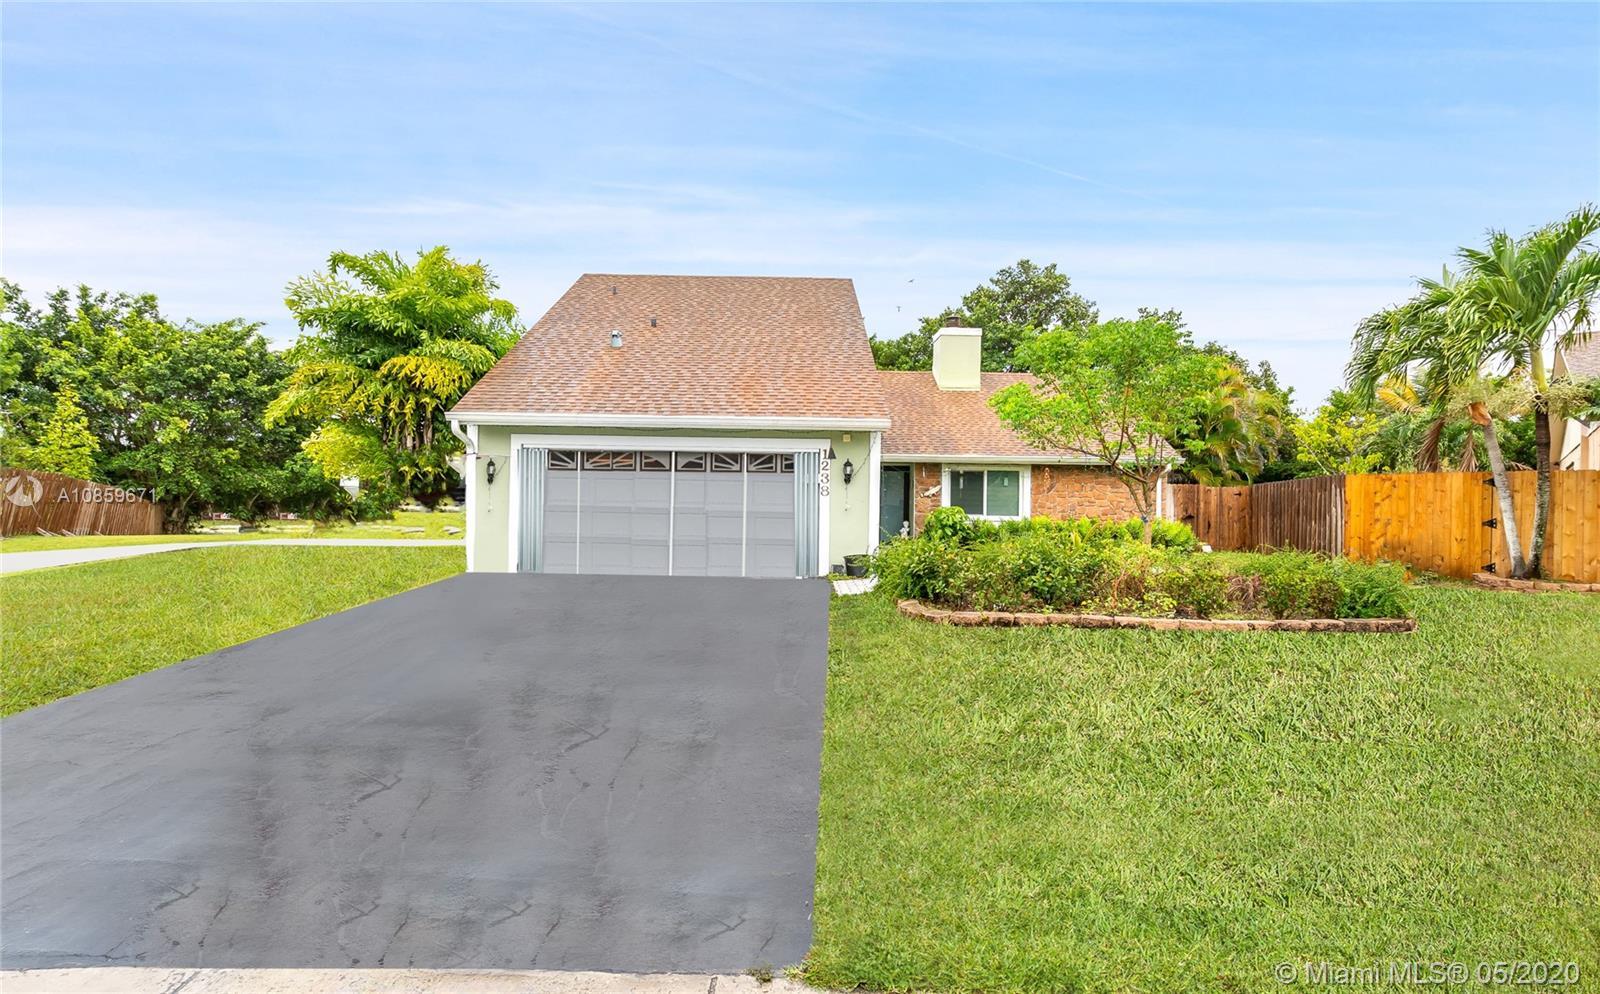 1238 S Fieldlark Ln, Homestead, FL 33035 - Homestead, FL real estate listing